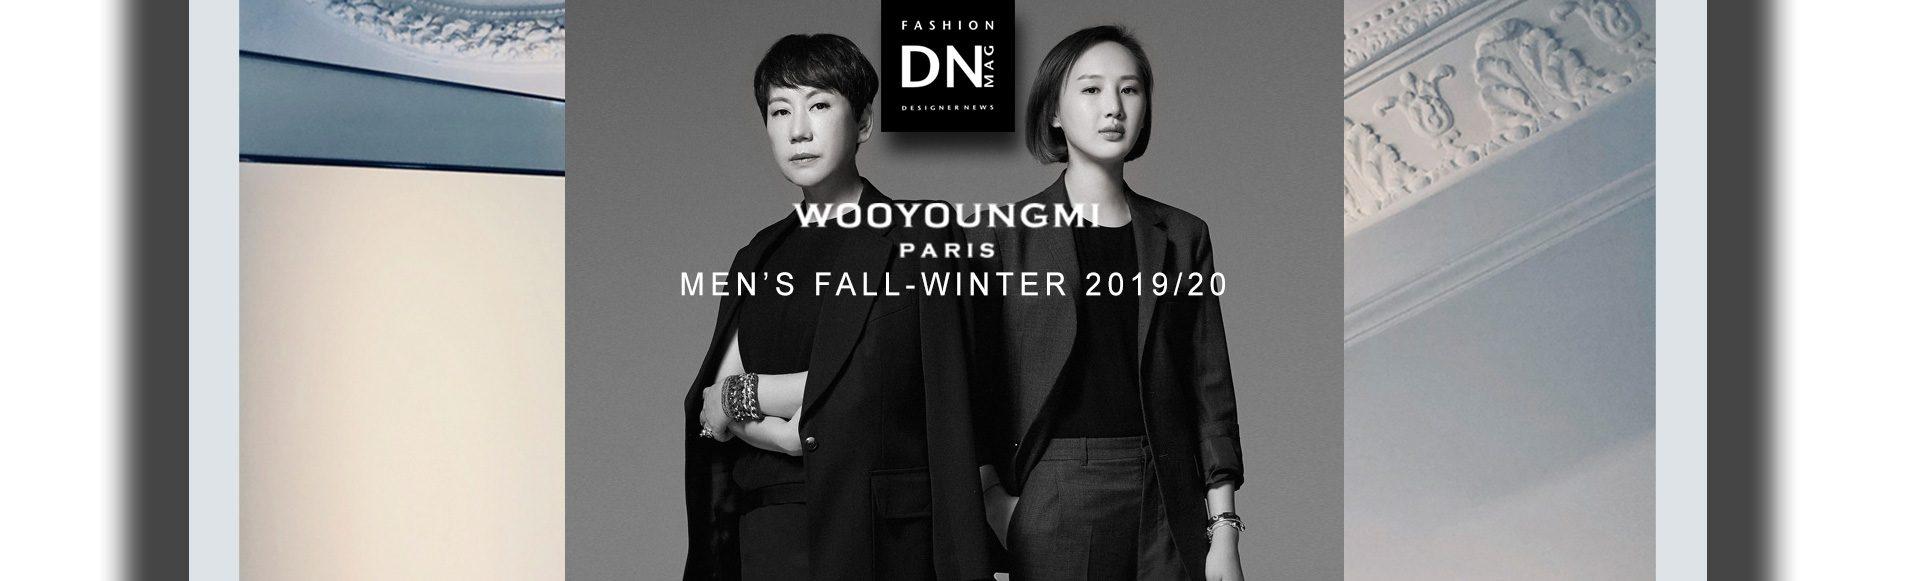 DNMAG-WOOYOUNGMI-MEN-SS-19